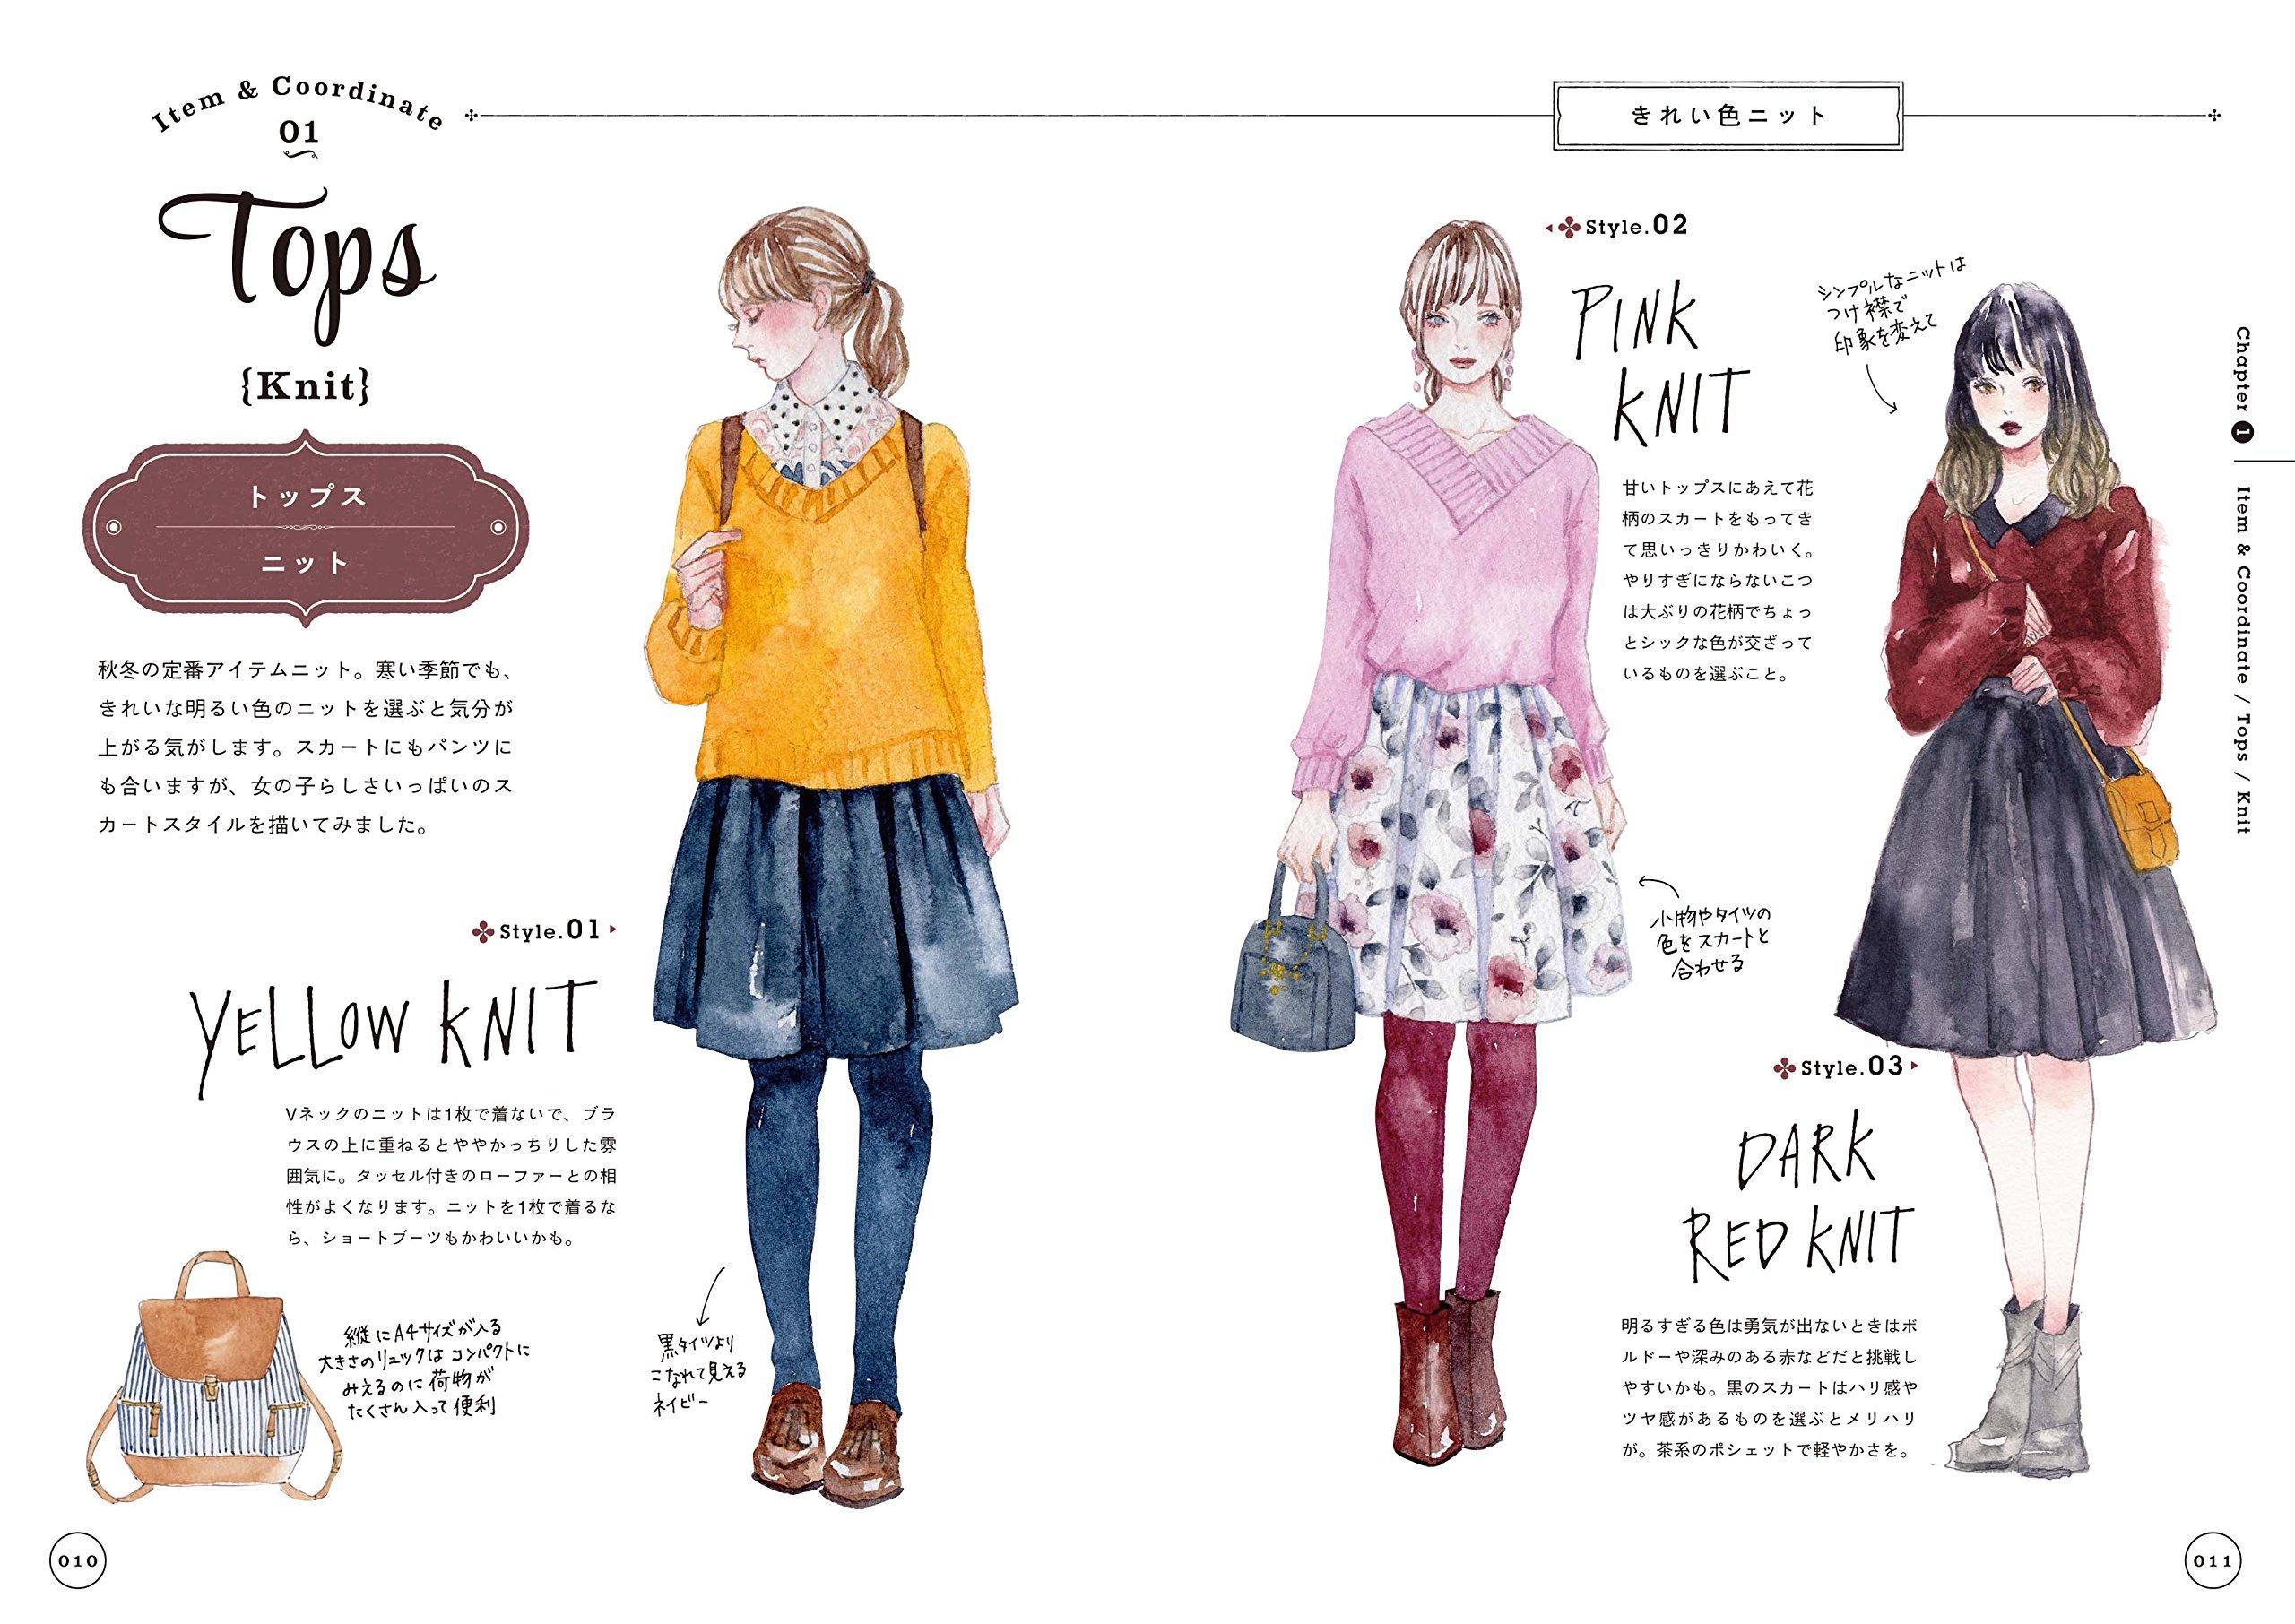 Fashion Girls Miyaファッションイラストブック Miyaミヤマアユミ